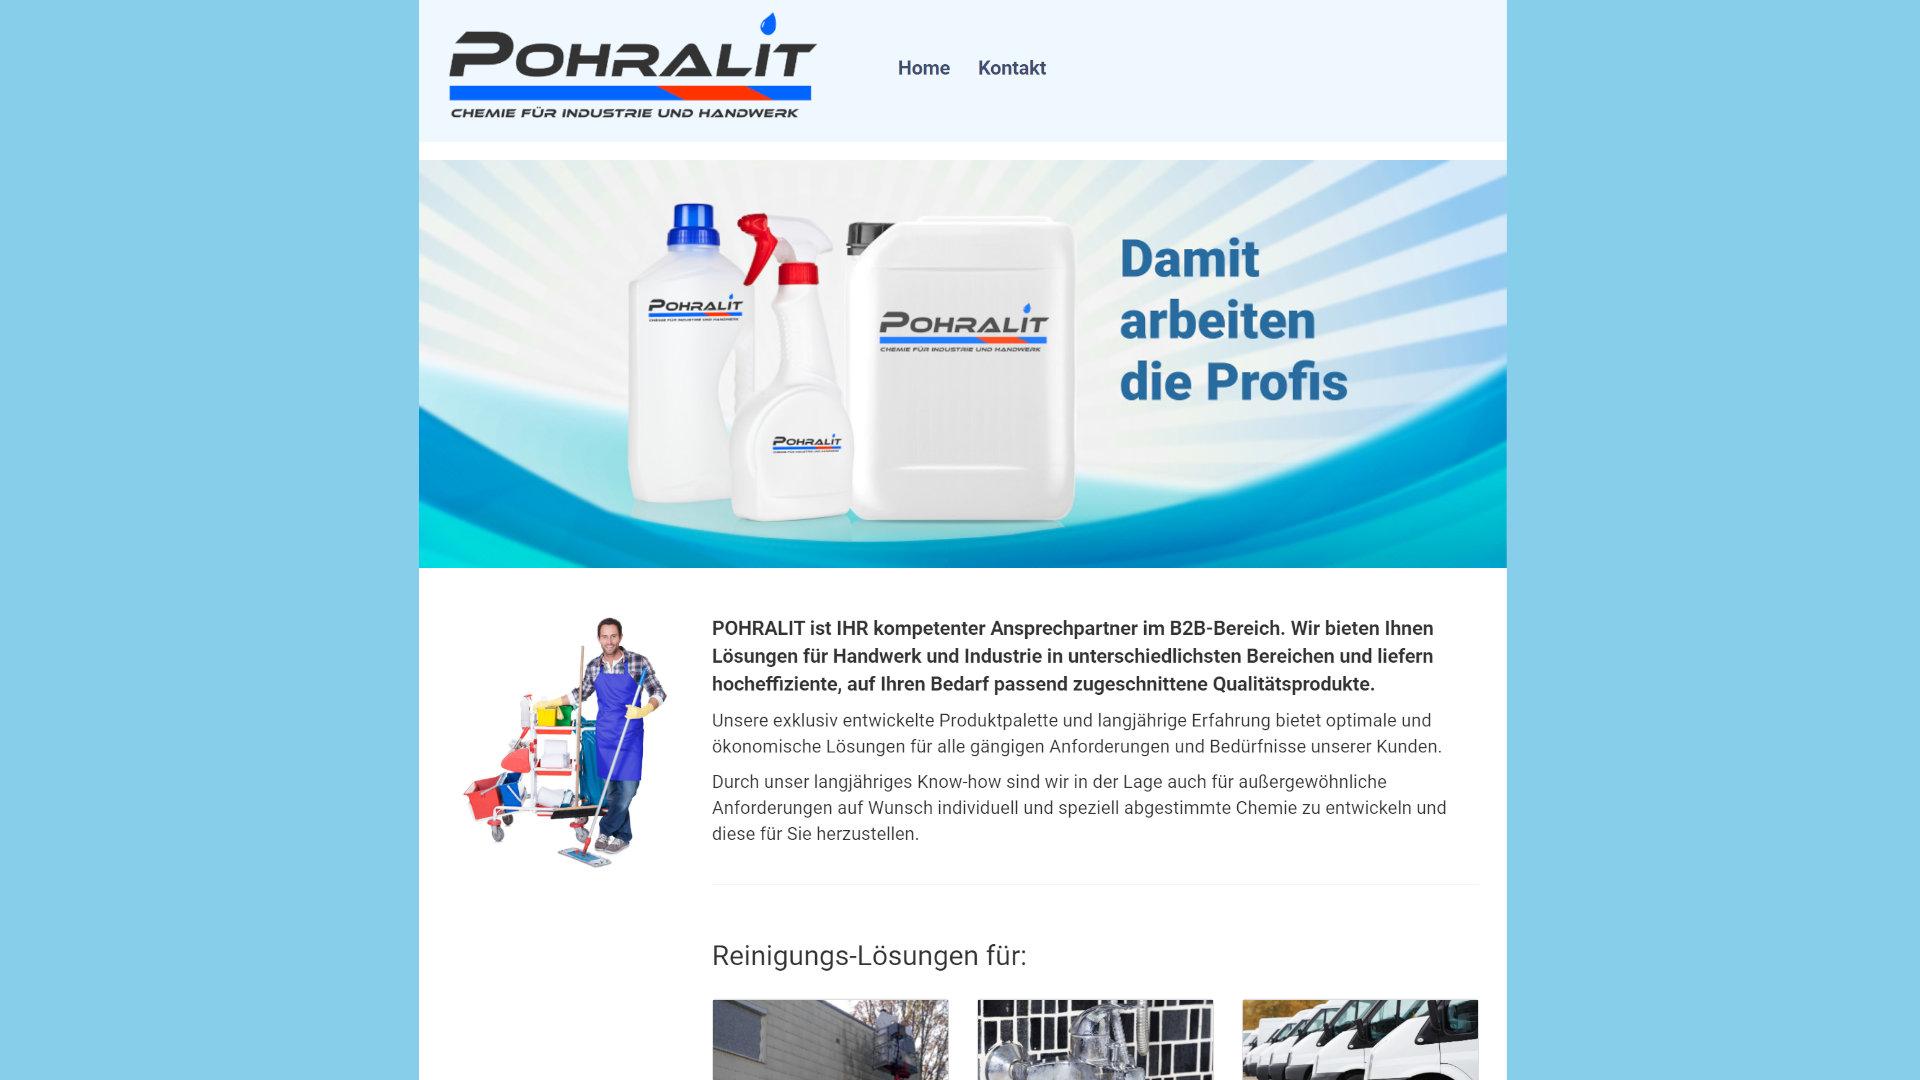 Screenshot: Homepage Pohralit